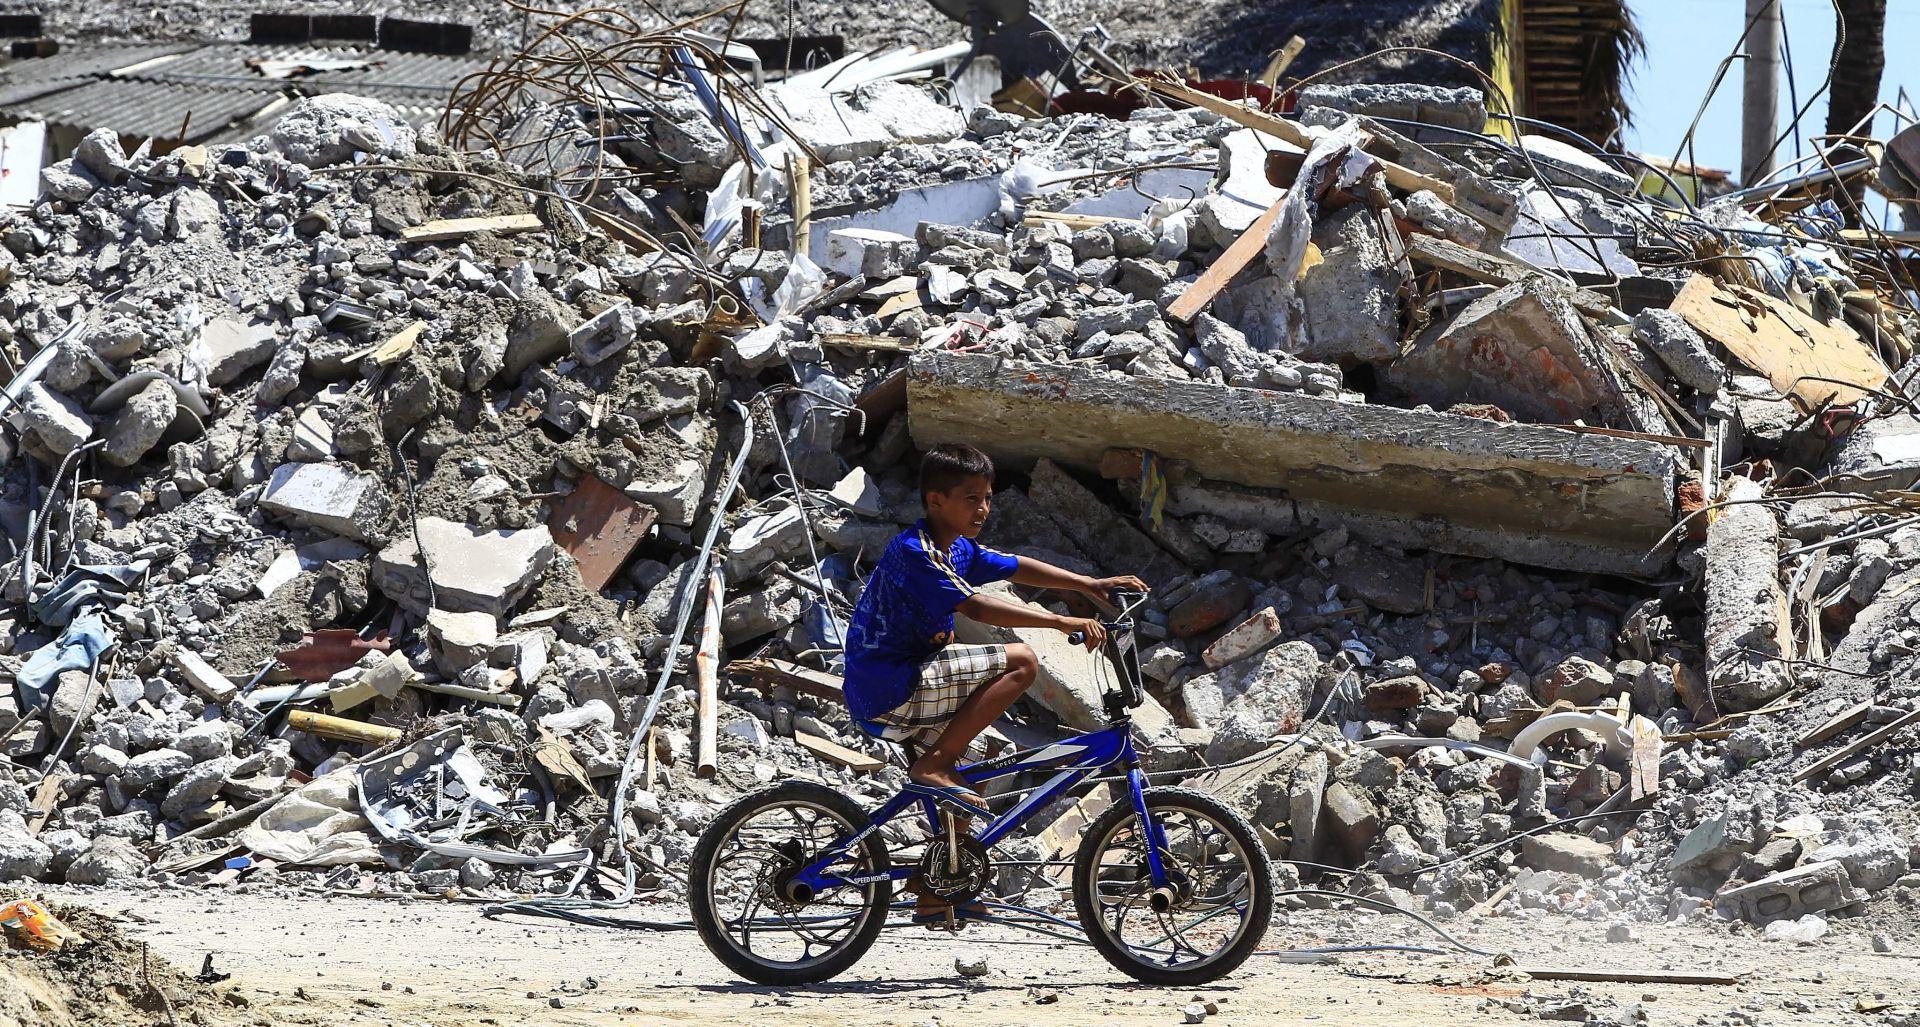 NEMA OPASNOSTI OD TSUNAMIJA: Potres magnitude 6,7 pogodio zapad Ekvadora